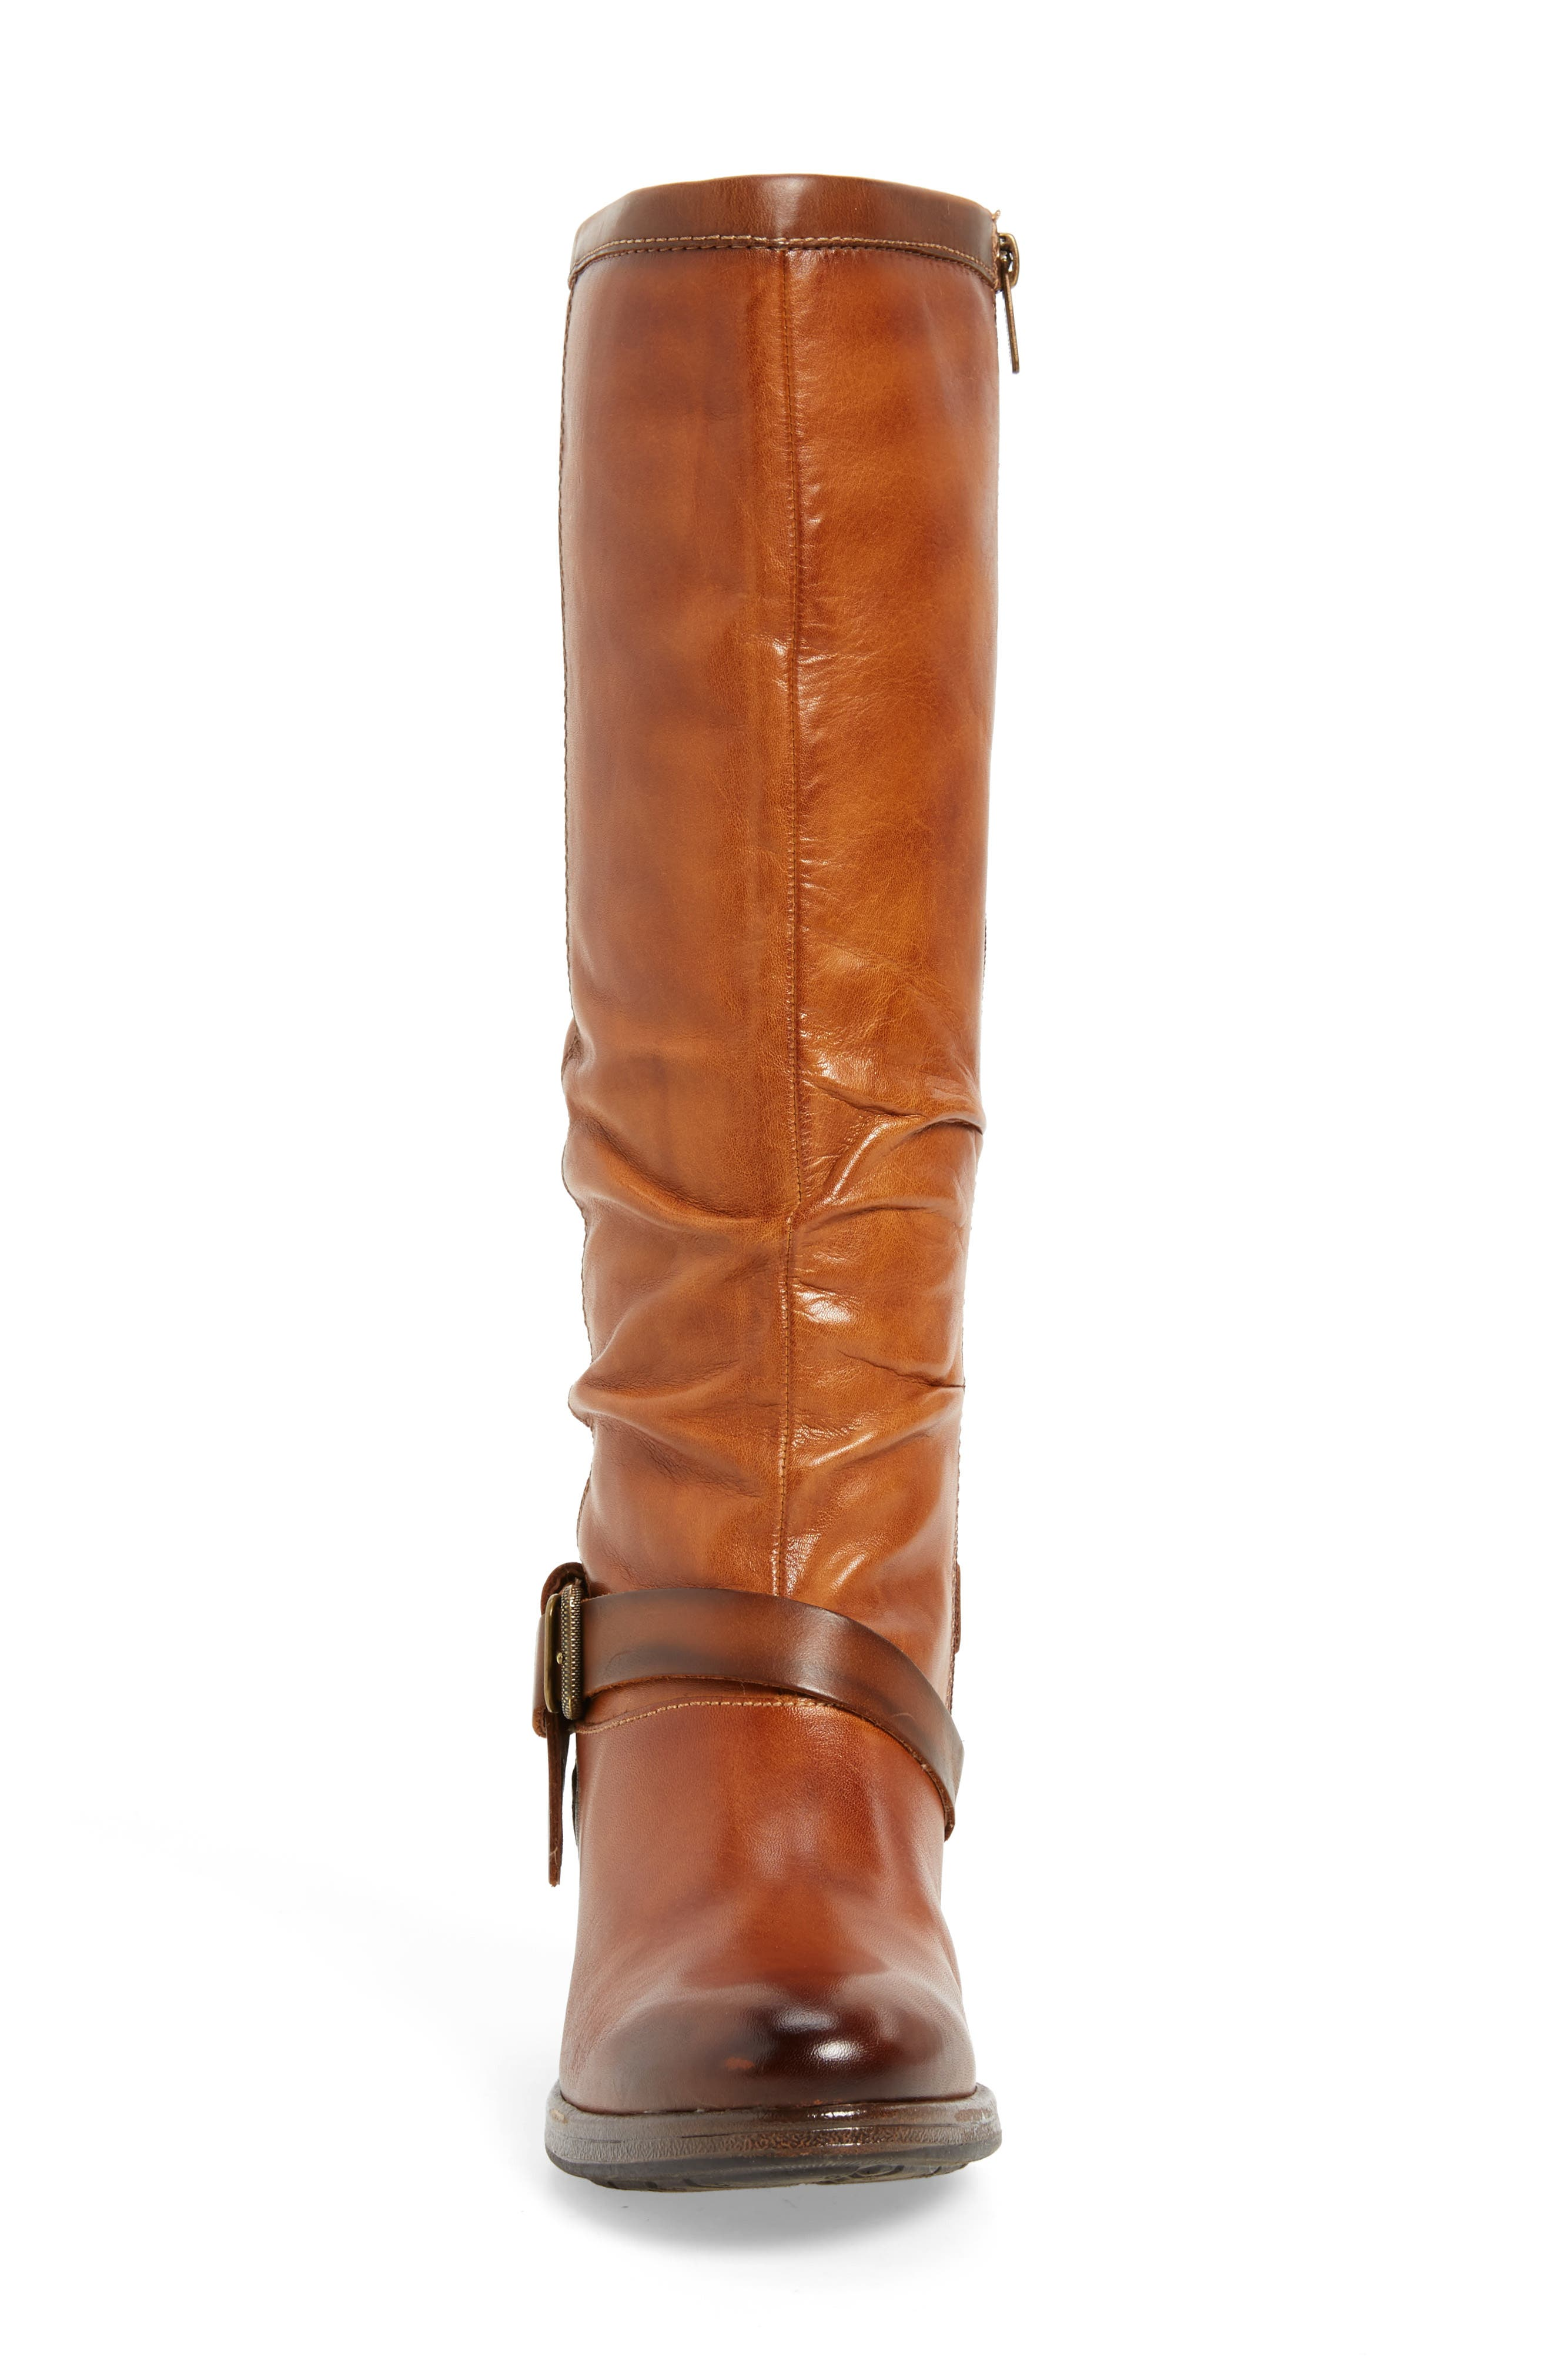 Ordino Knee High Boot,                             Alternate thumbnail 4, color,                             Brandy Cuero Leather